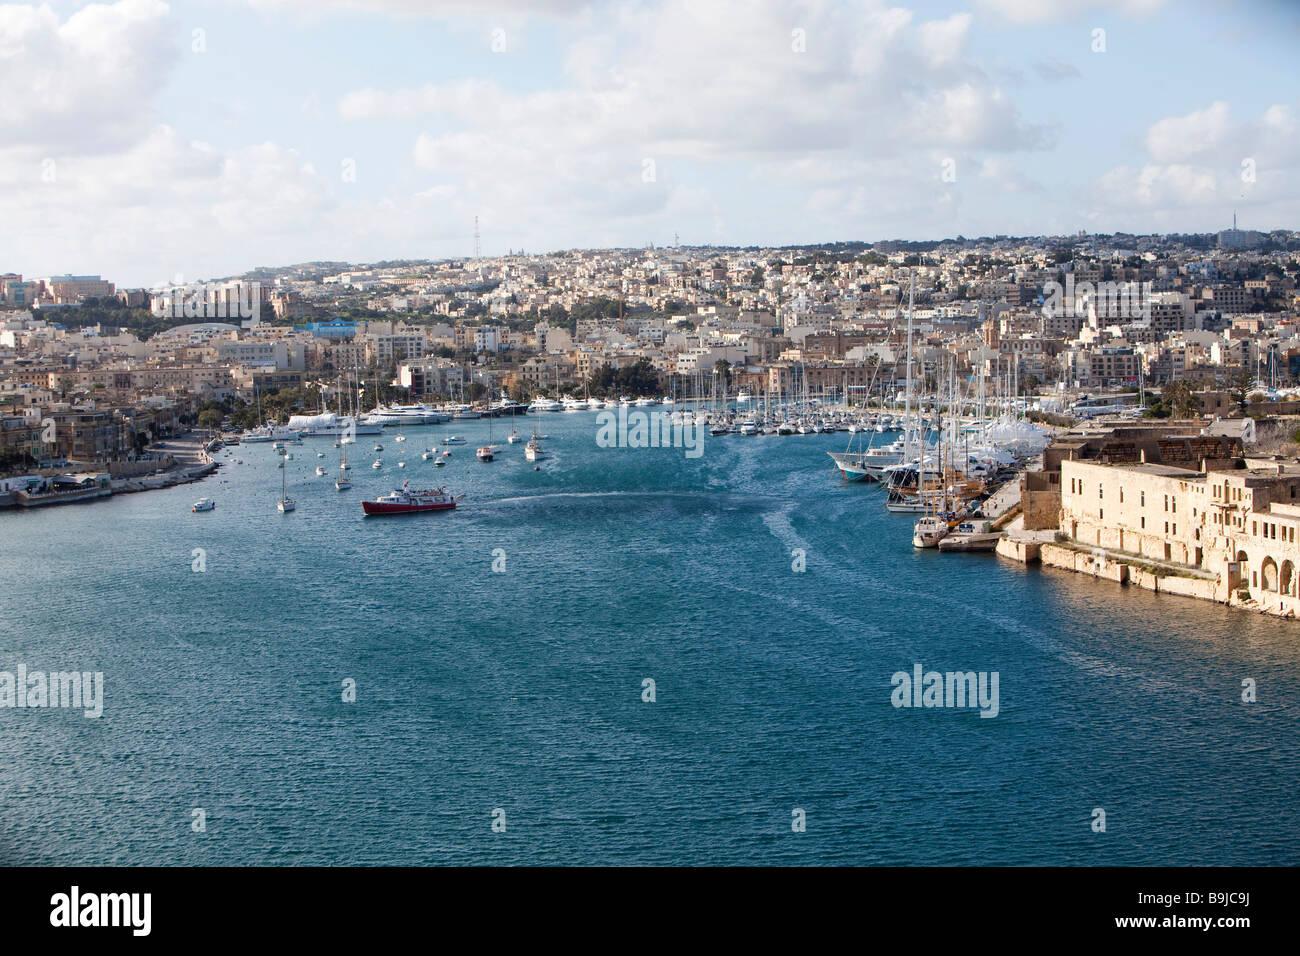 View of Marsamxett Harbour and Lazzaretto Creek from Valletta, Malta, Europe - Stock Image